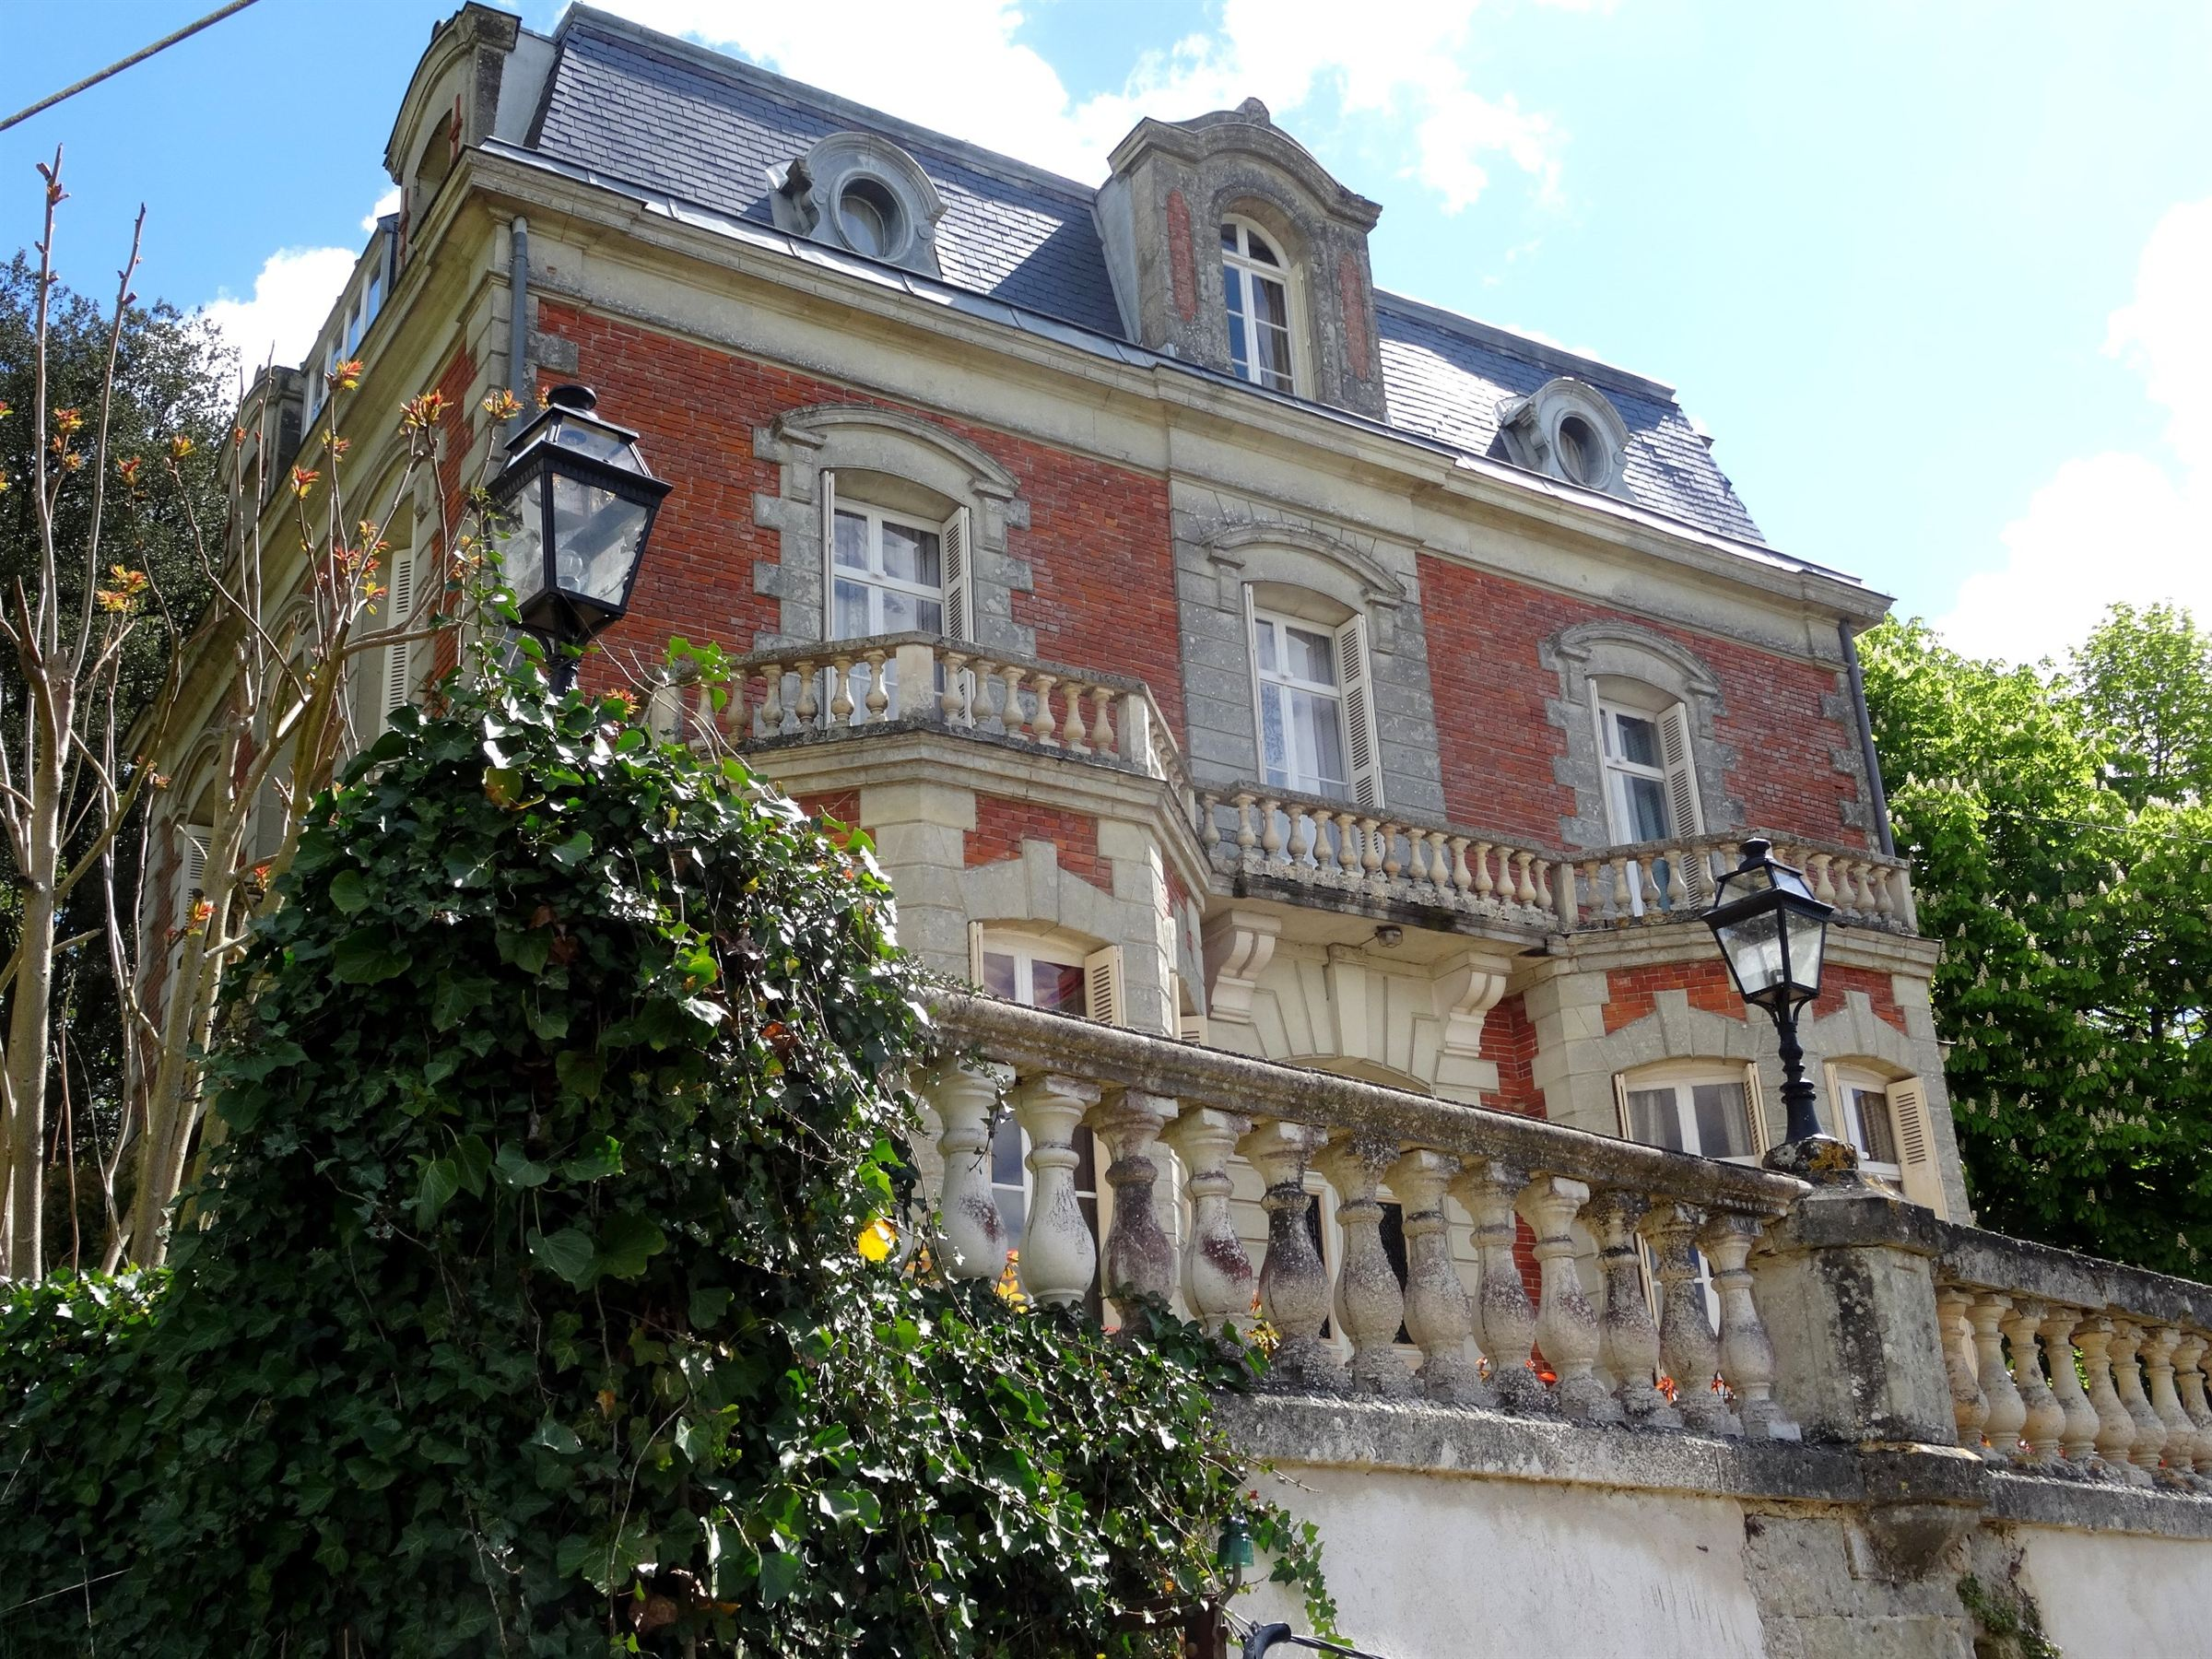 Casa Unifamiliar por un Venta en Your castle in France, in the Loire valley of kings Tours, Centro, 37000 Francia